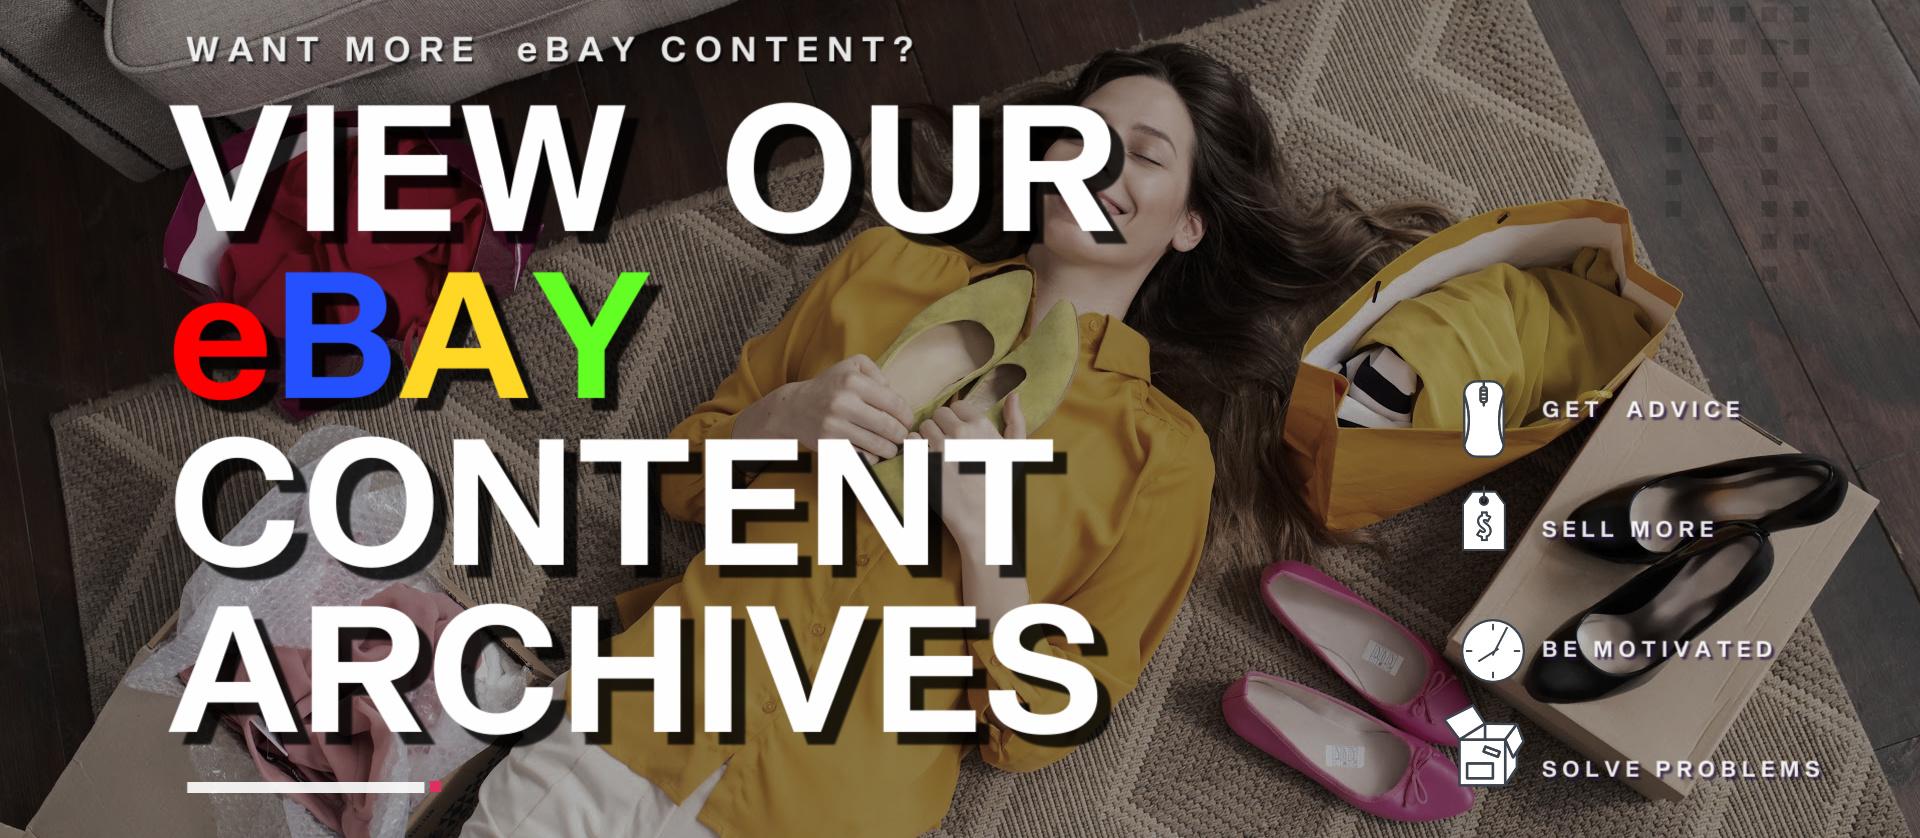 ebay-selling-help-blogs.jpg